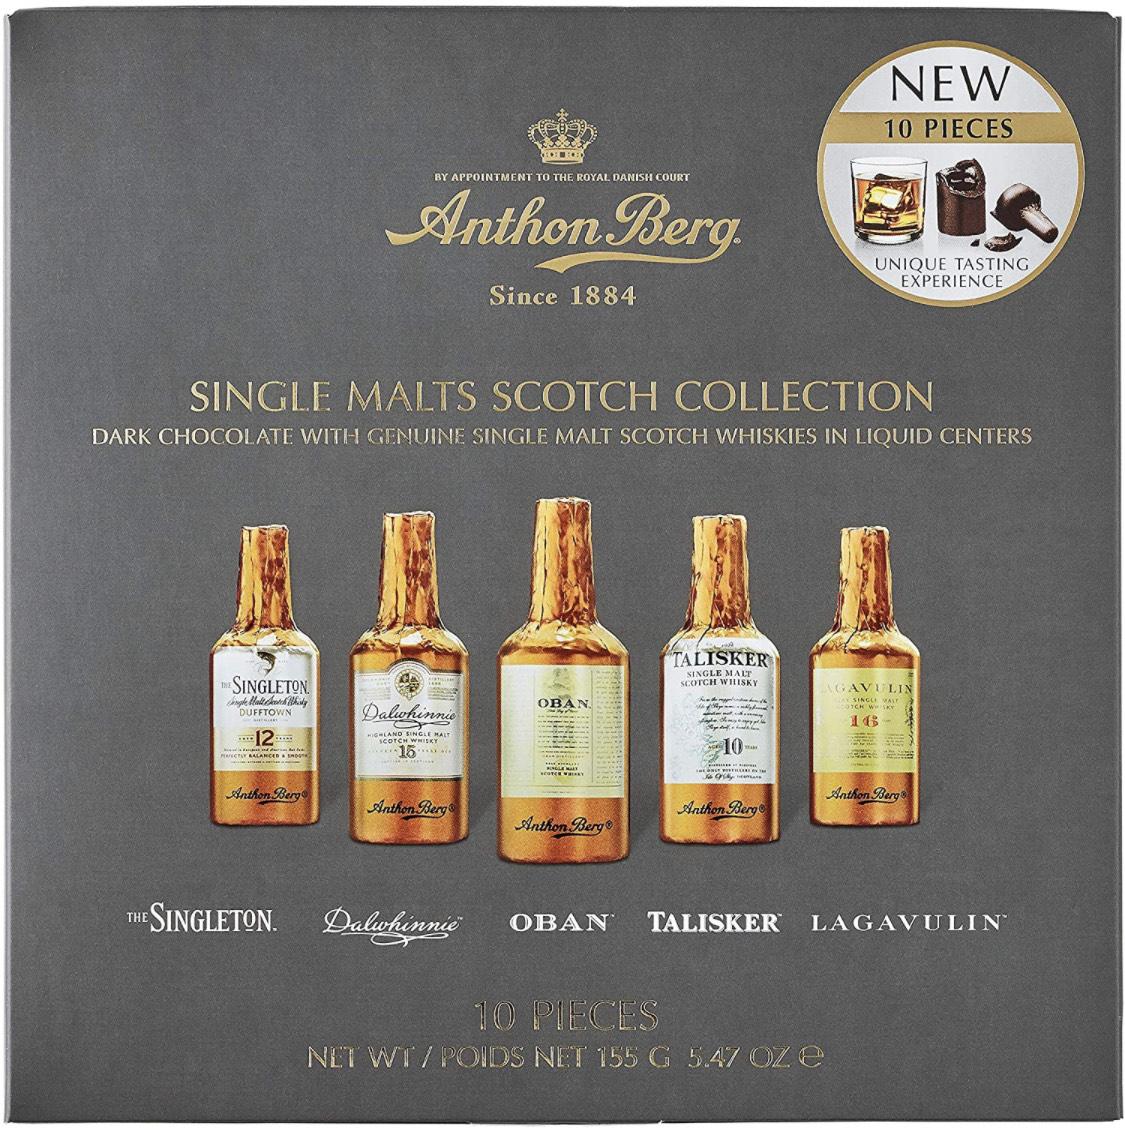 Anthon Berg - Chocolate Liqueurs - 5 Premium Single Malts Scotch Whiskies 155g - £4.08 (+£4.49 Non-Prime) @ Amazon